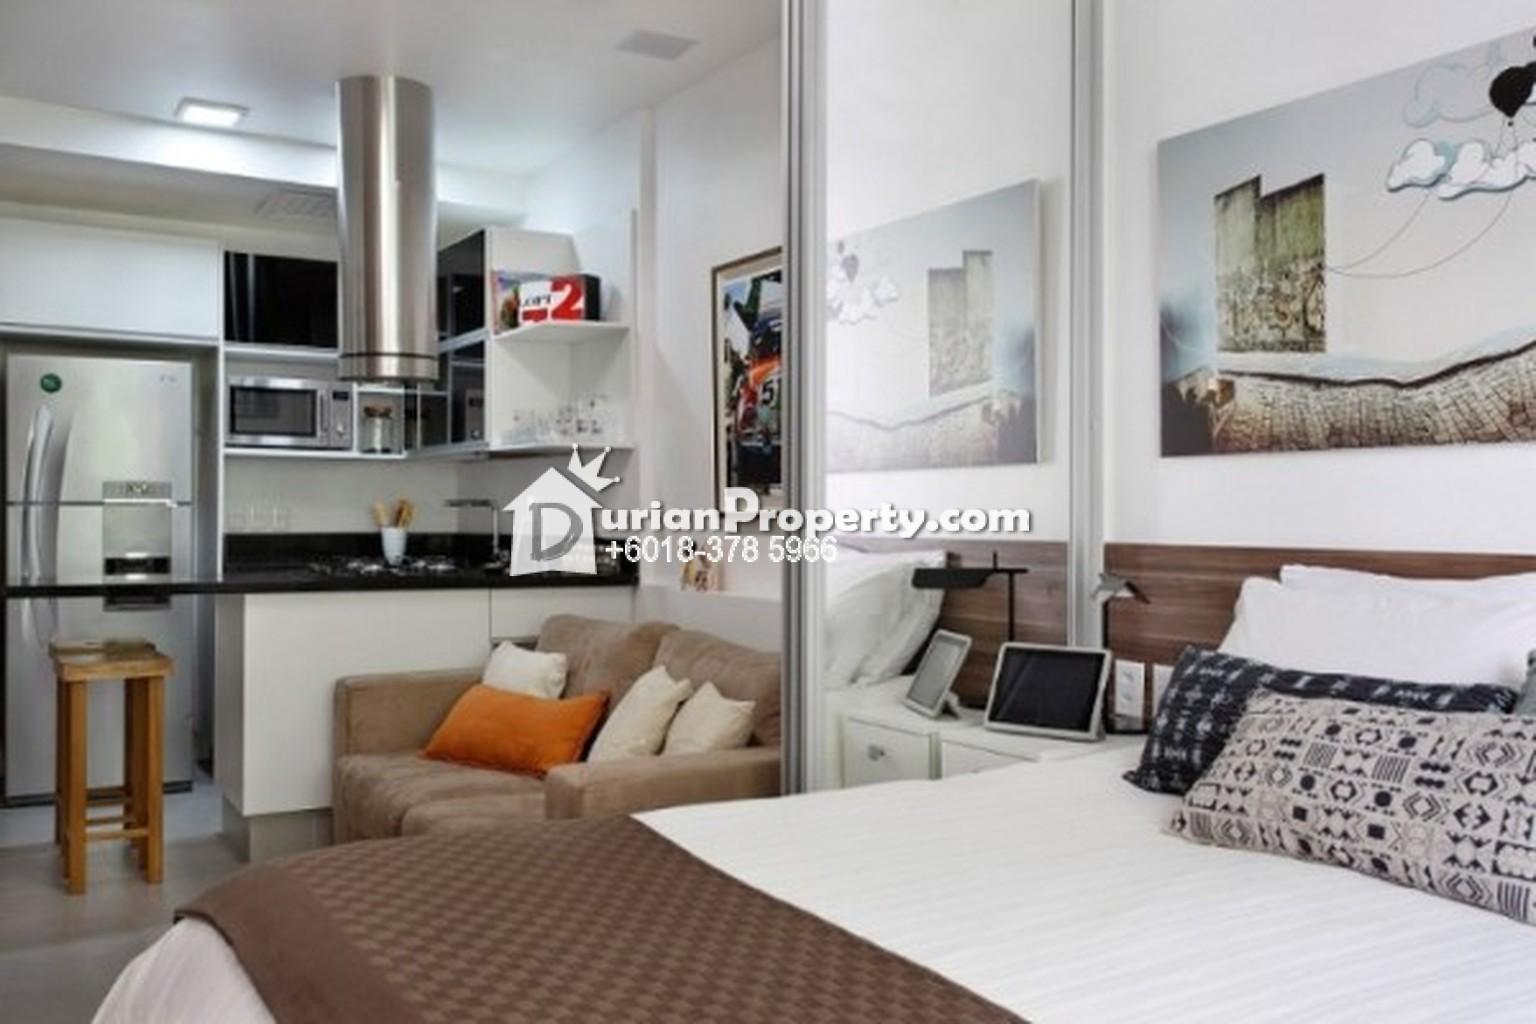 Дизайн интерьера квартиры-студии 25 кв. м: стили, функционал.